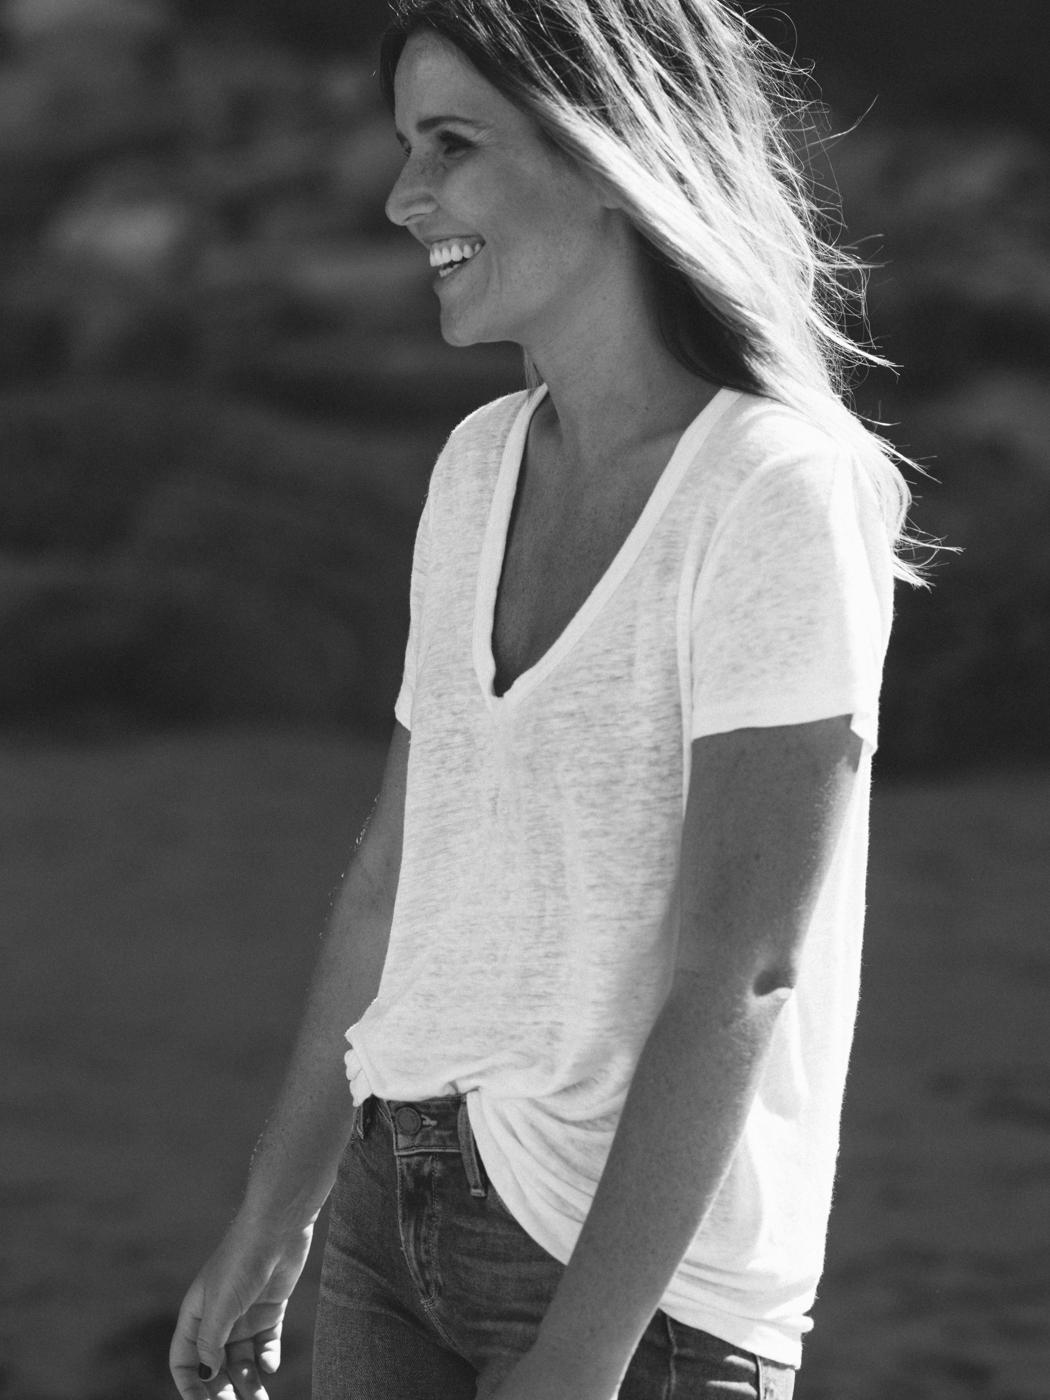 Chloe-Brinklow-TOMBOY